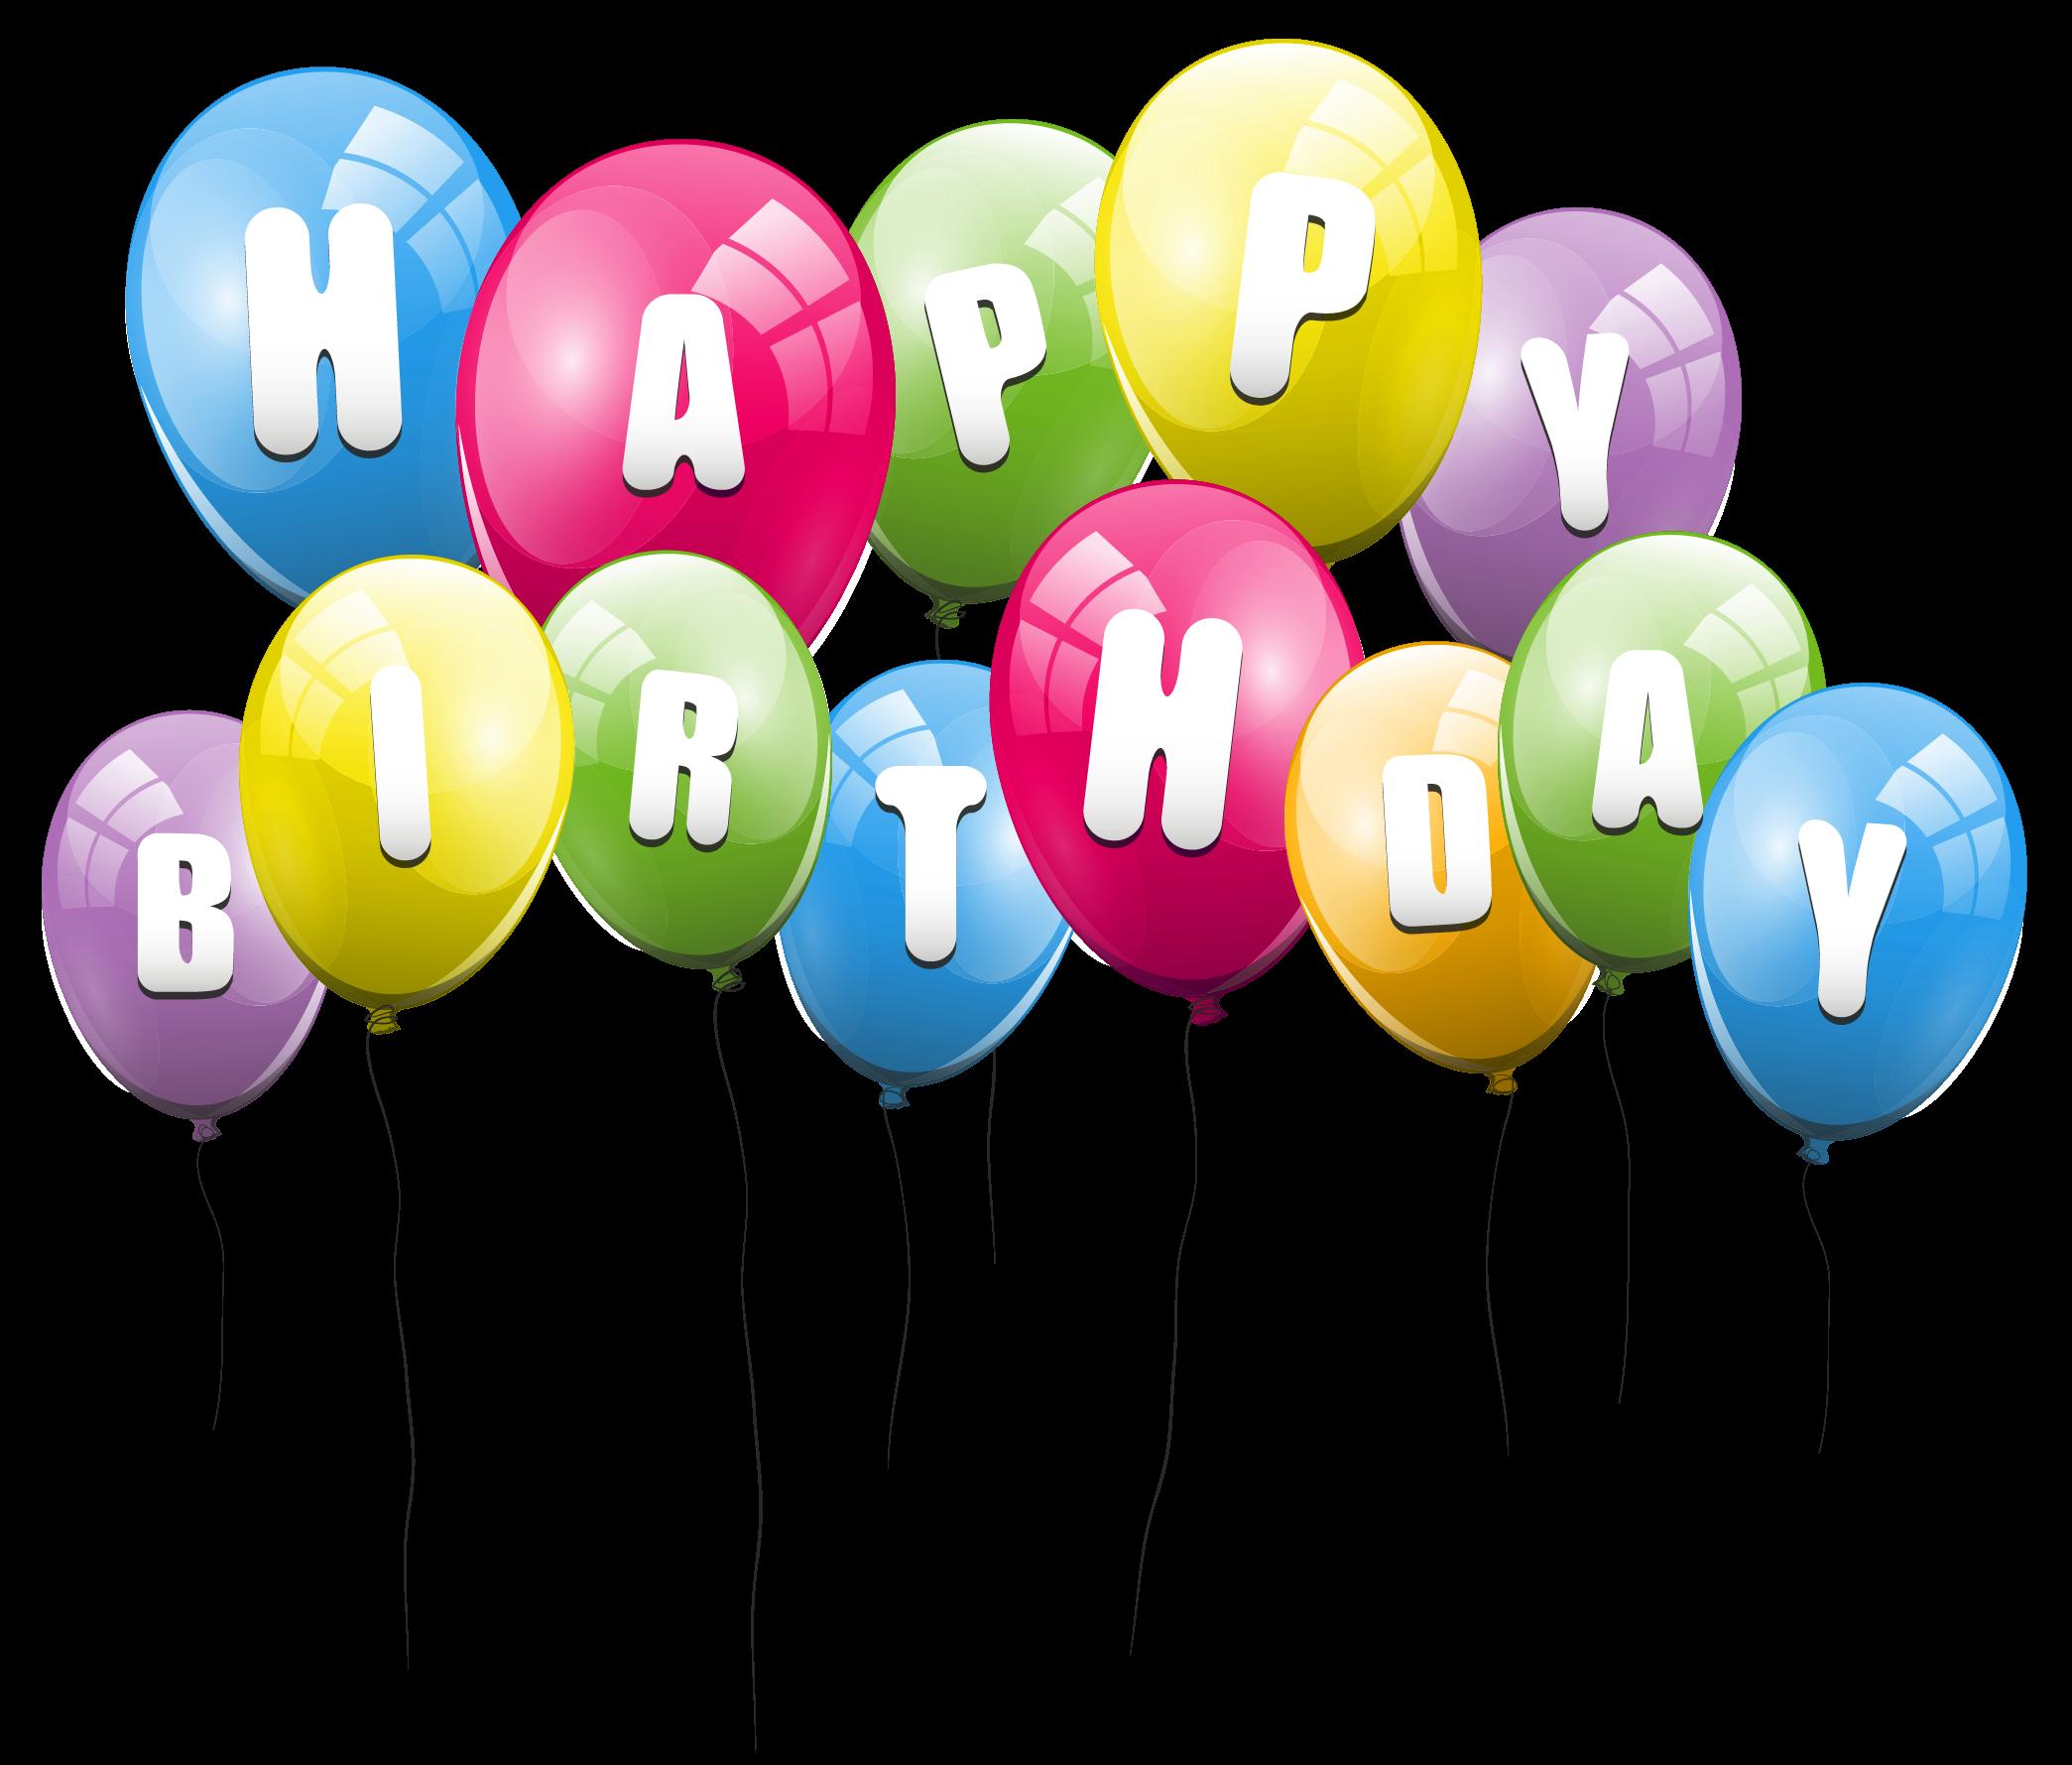 Transparent Multi Color Balloons Clipart.